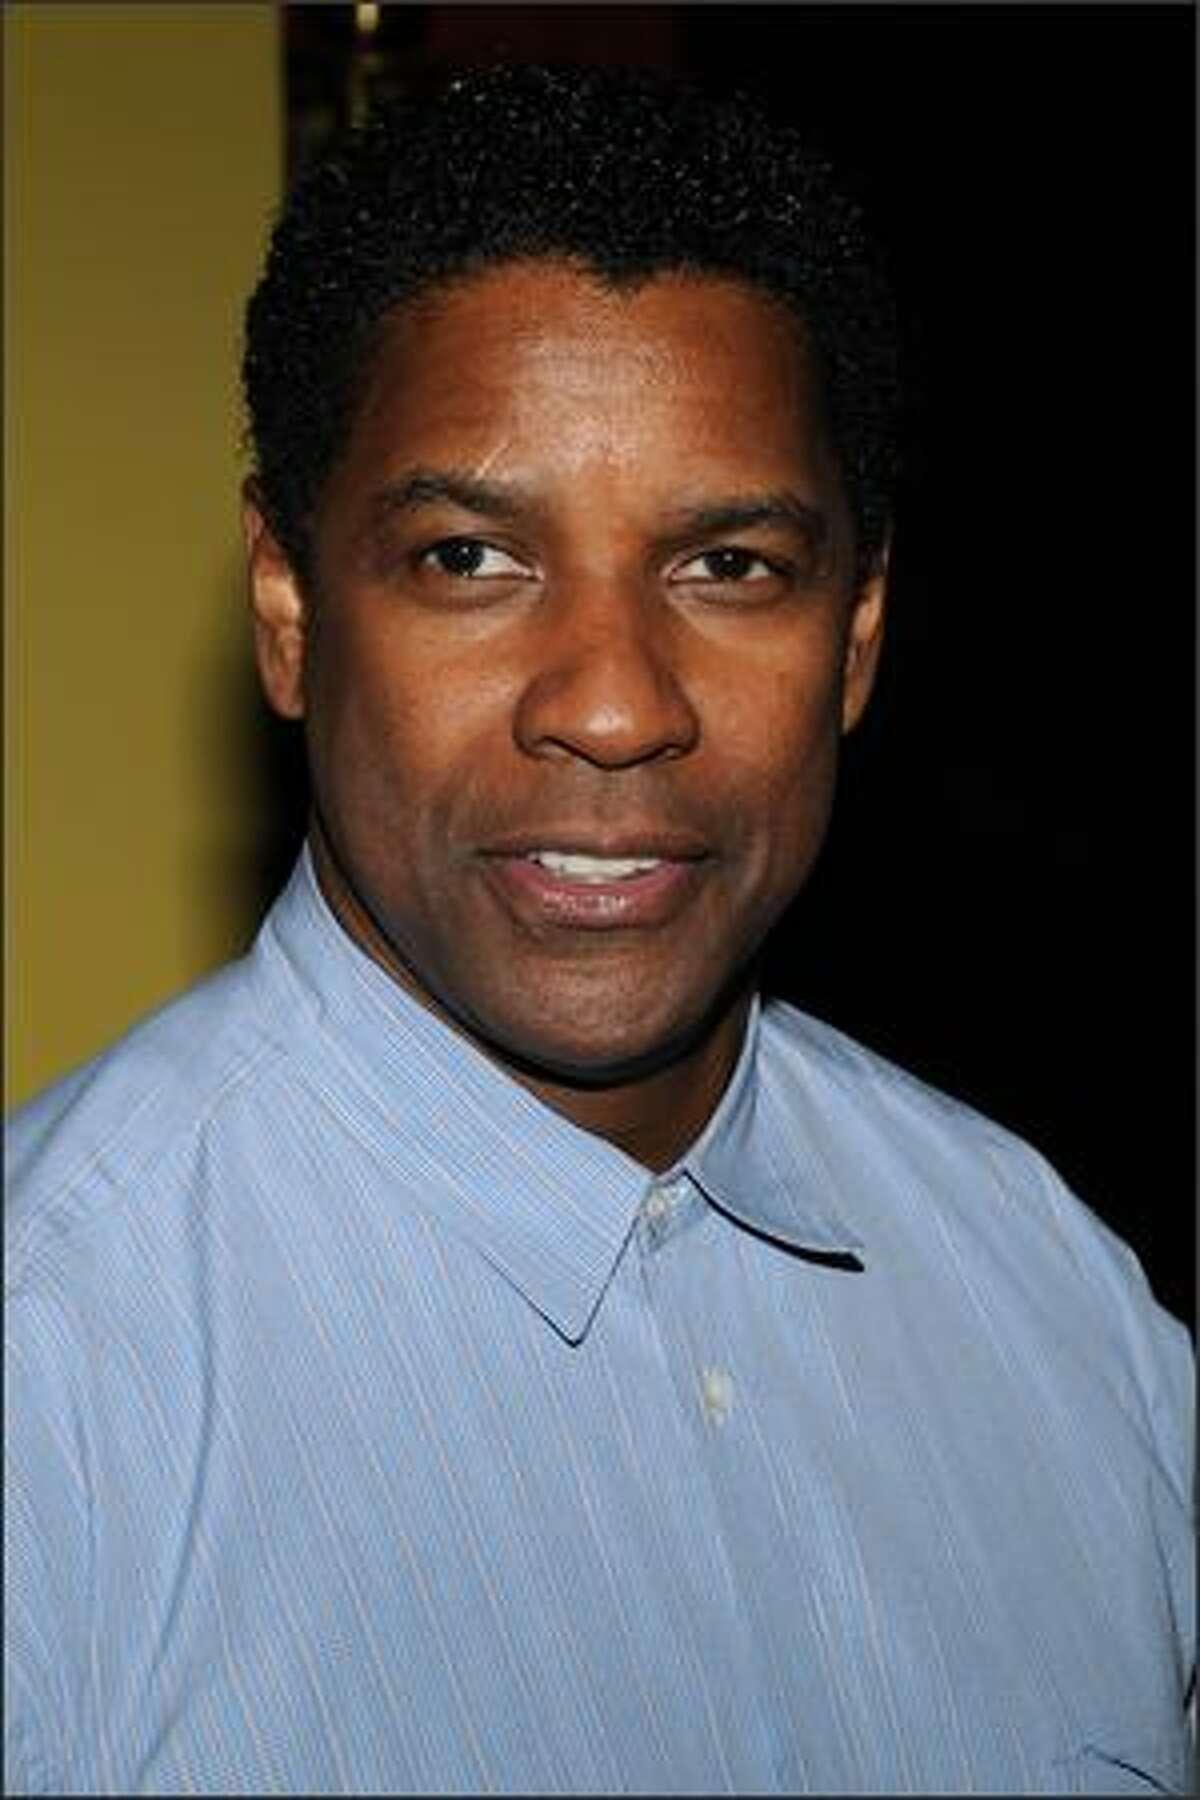 Actor Denzel Washington arrives at the premiere of